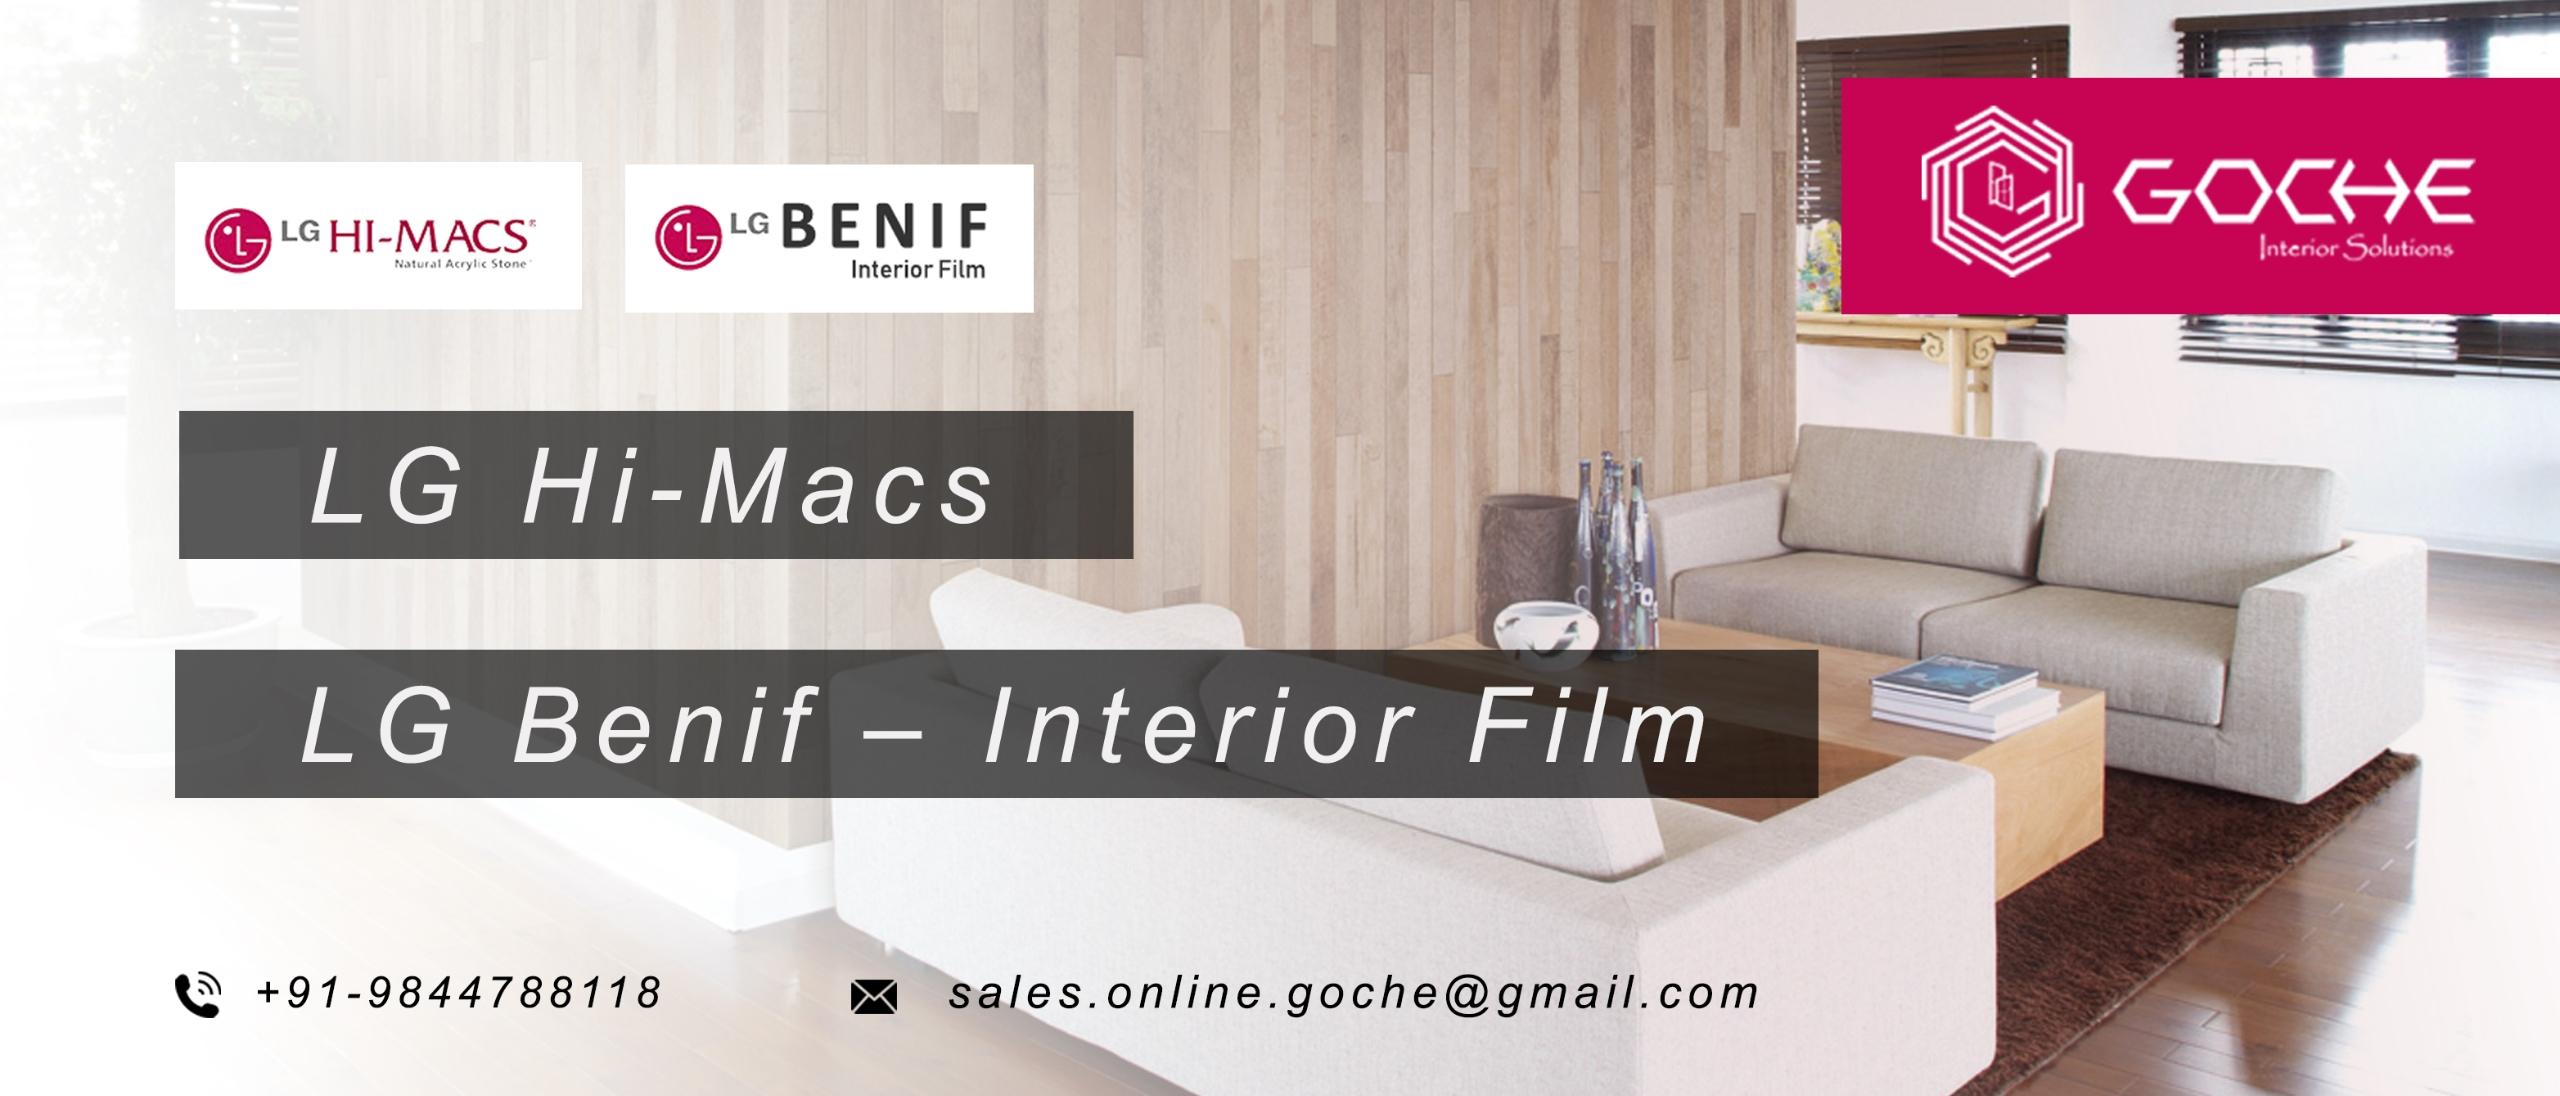 Goche Interior Solutions (@gocheinteriorsolutions) Cover Image